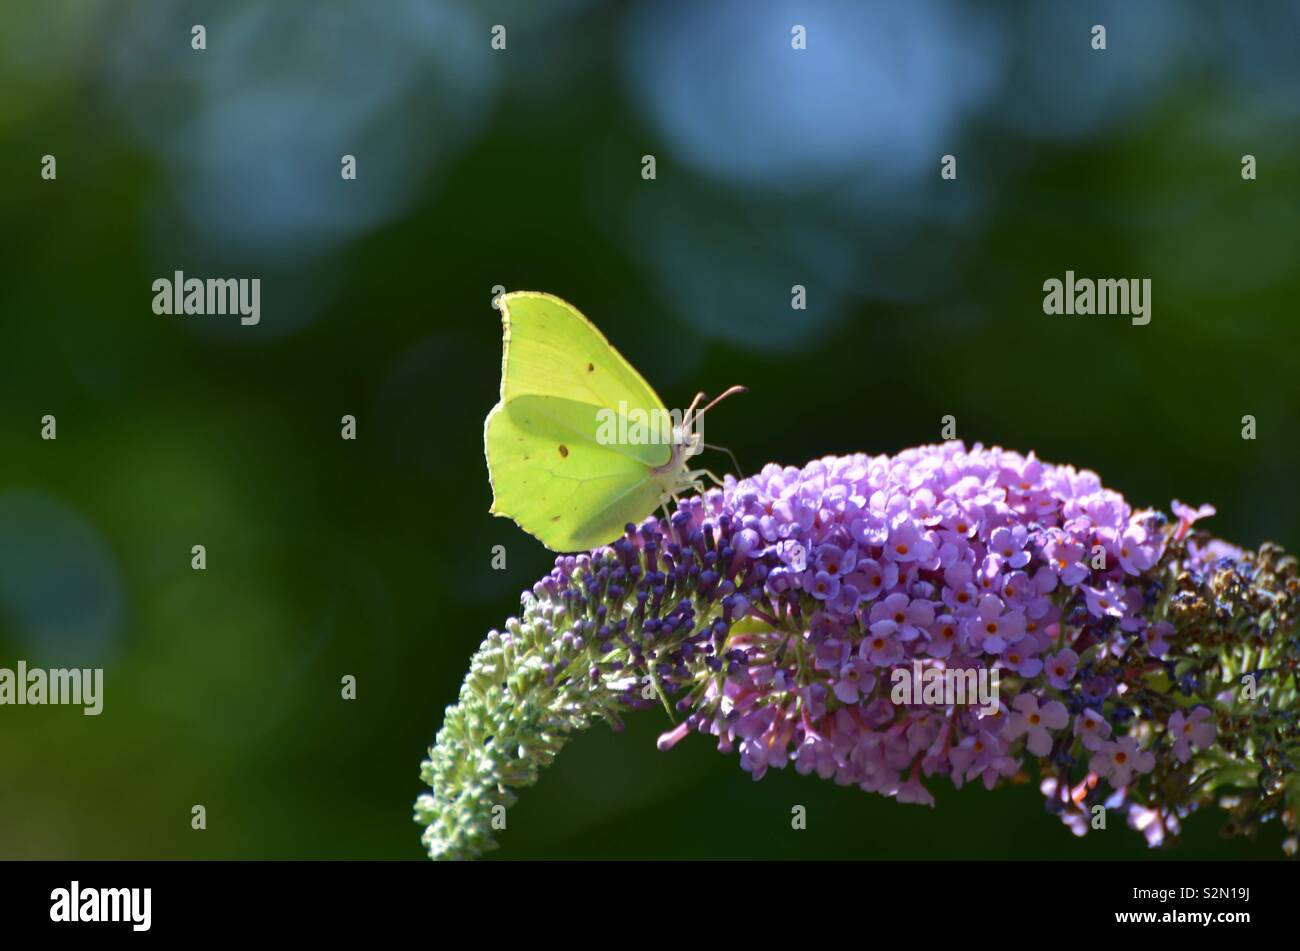 Zitronenfalter auf Buddleia - Stock Image